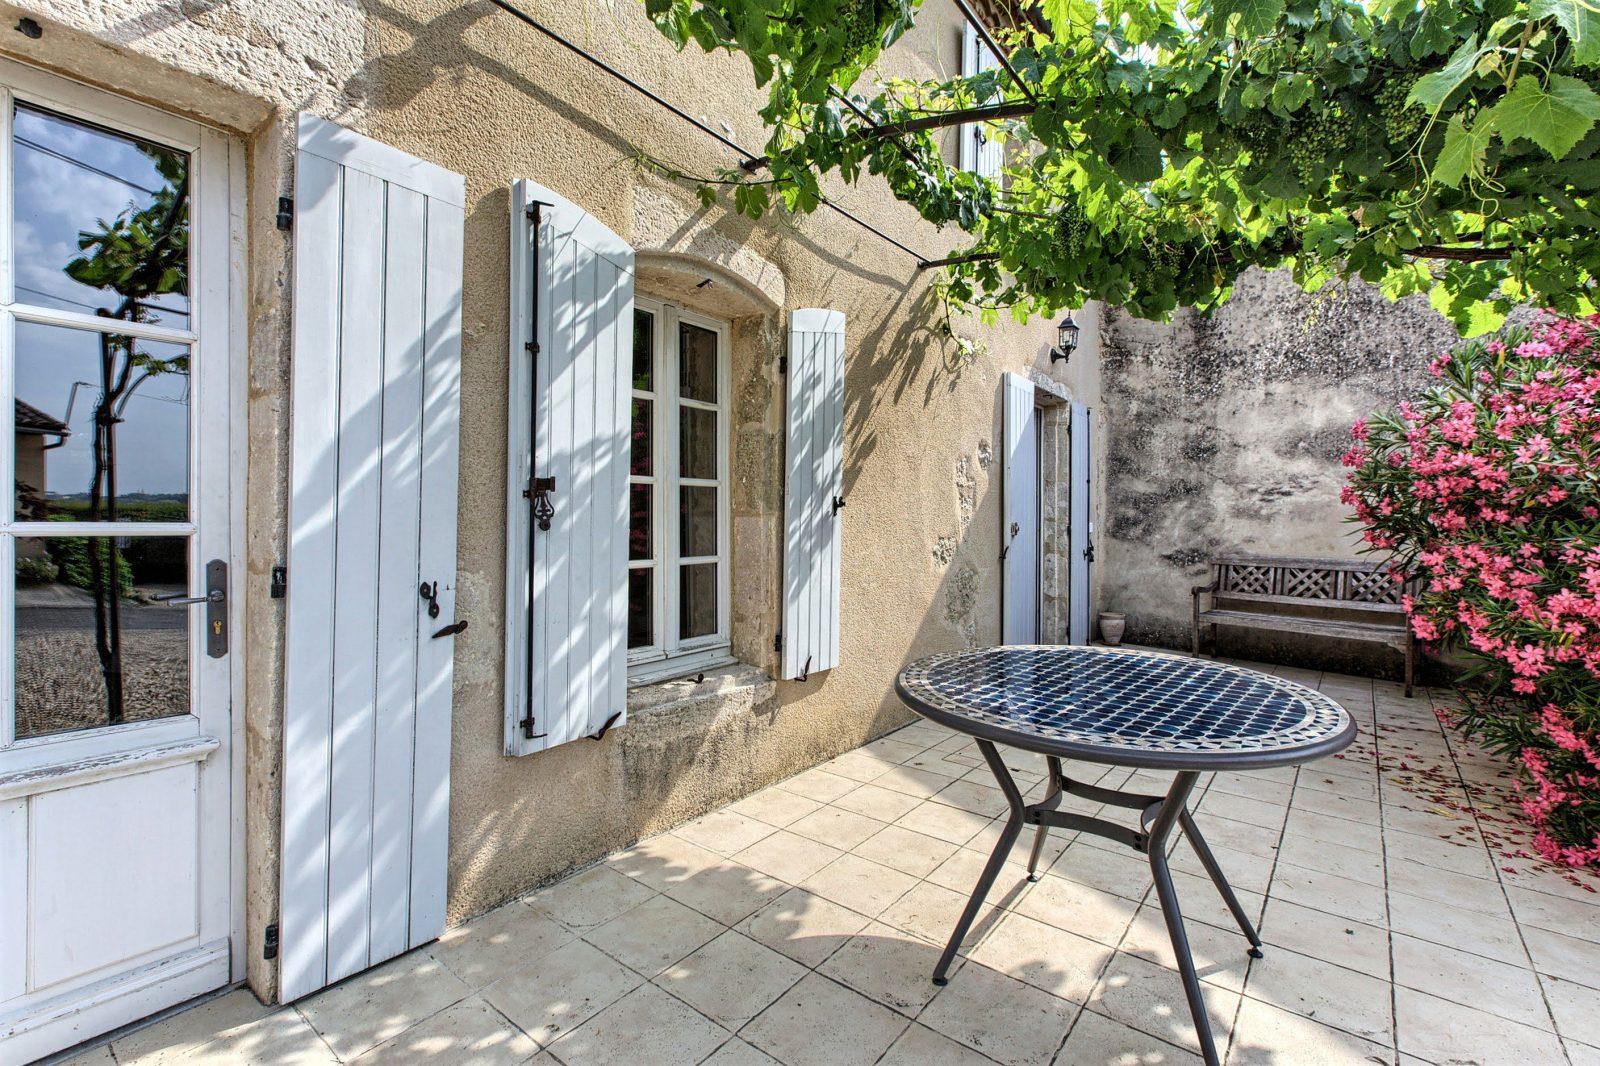 Saint-Seurin-de-Cursac – Mme MORVAN